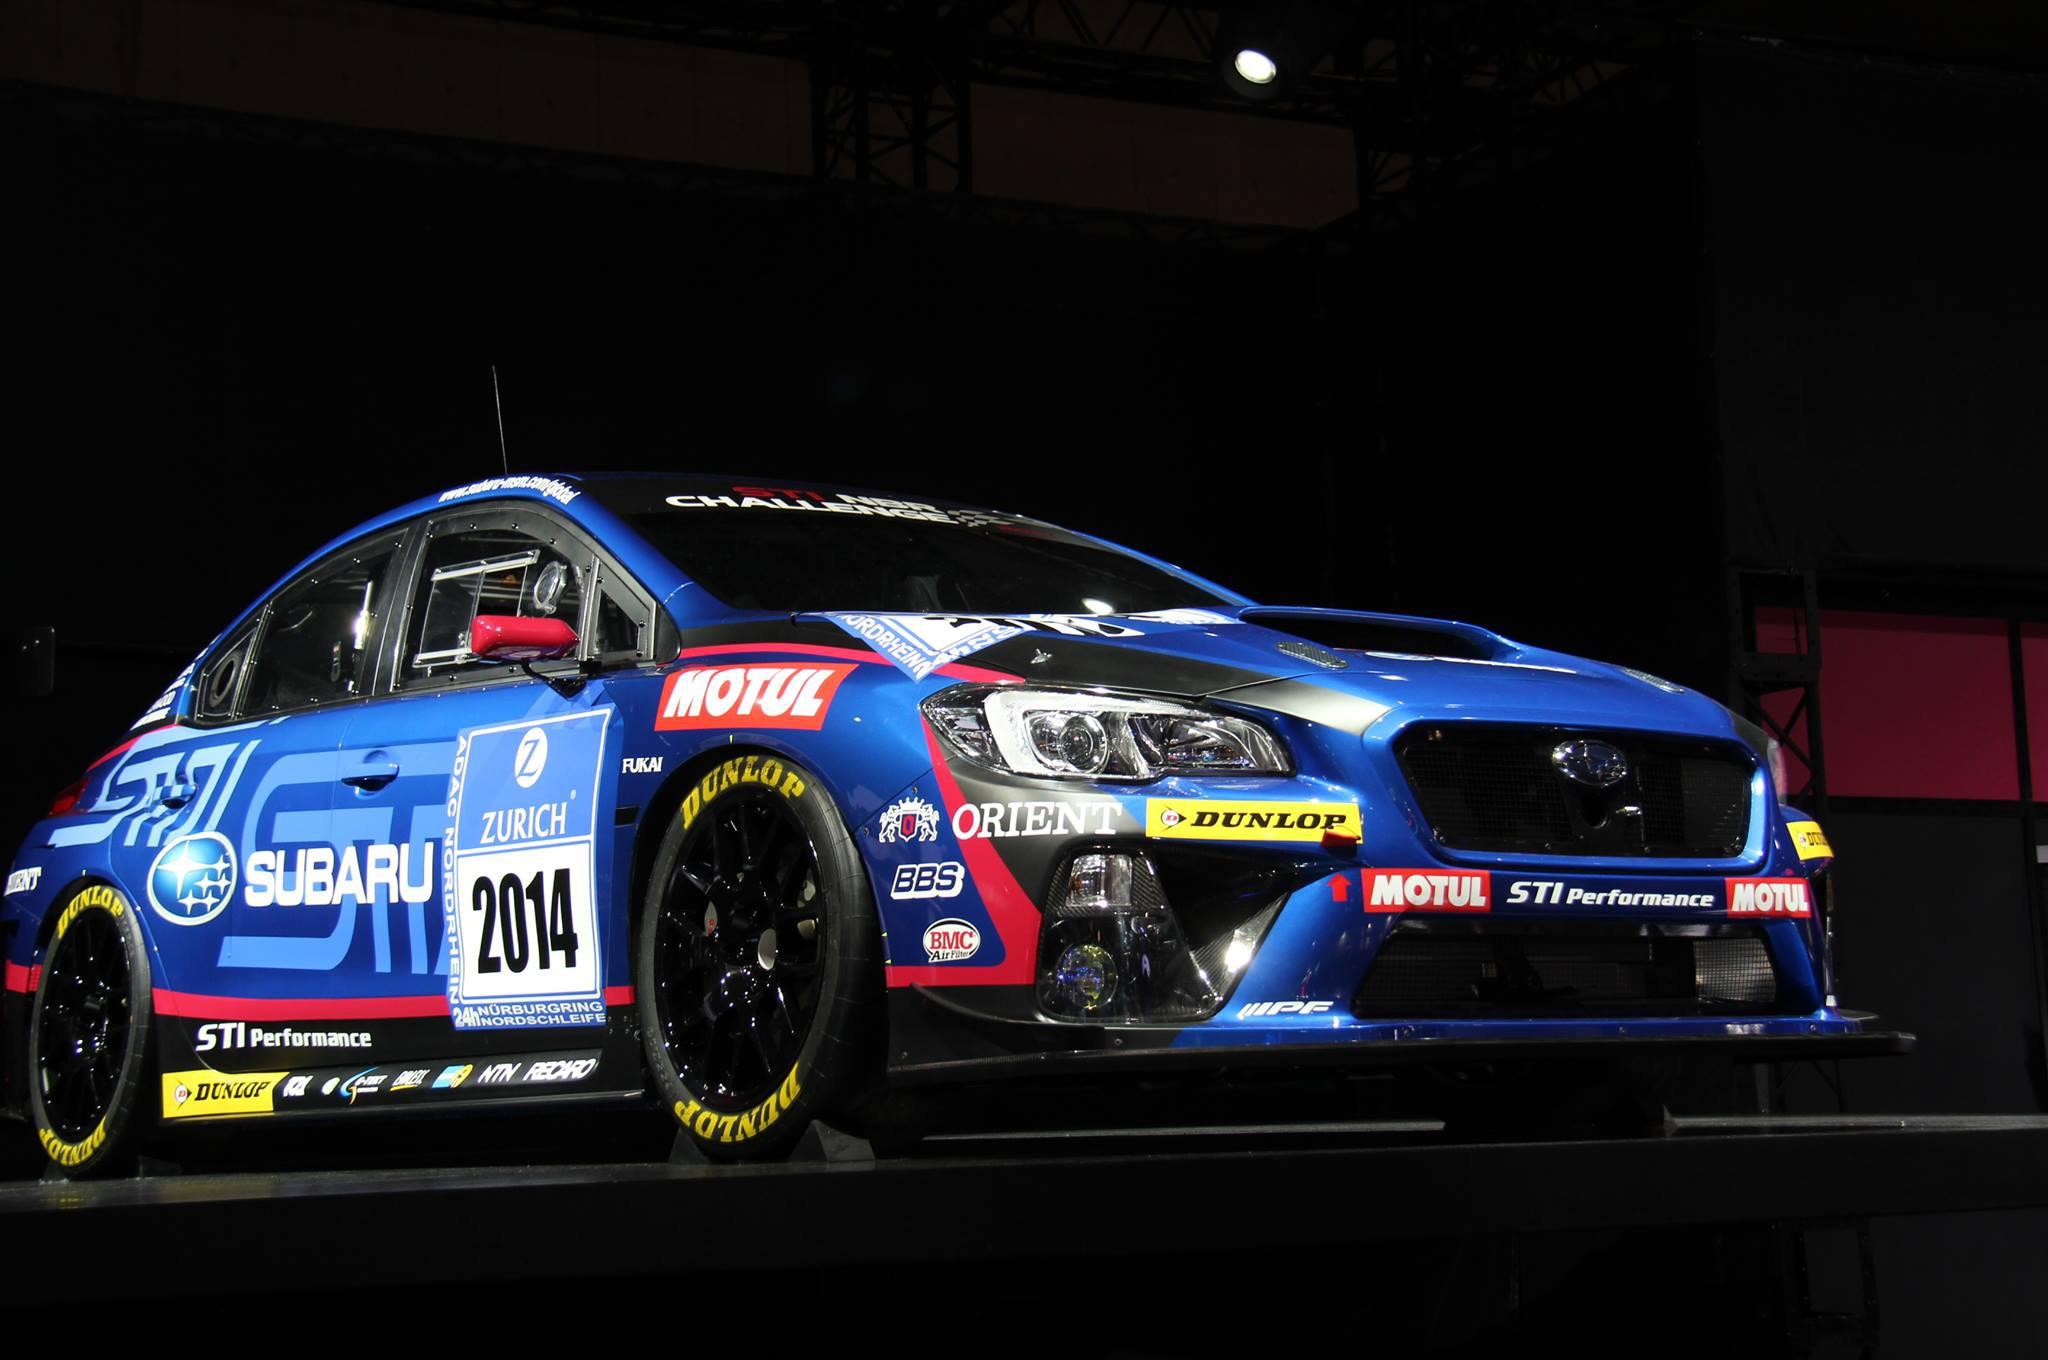 Subaru WRX STI Race Car Revealed For 24 Hours of Nurburgring Race ...